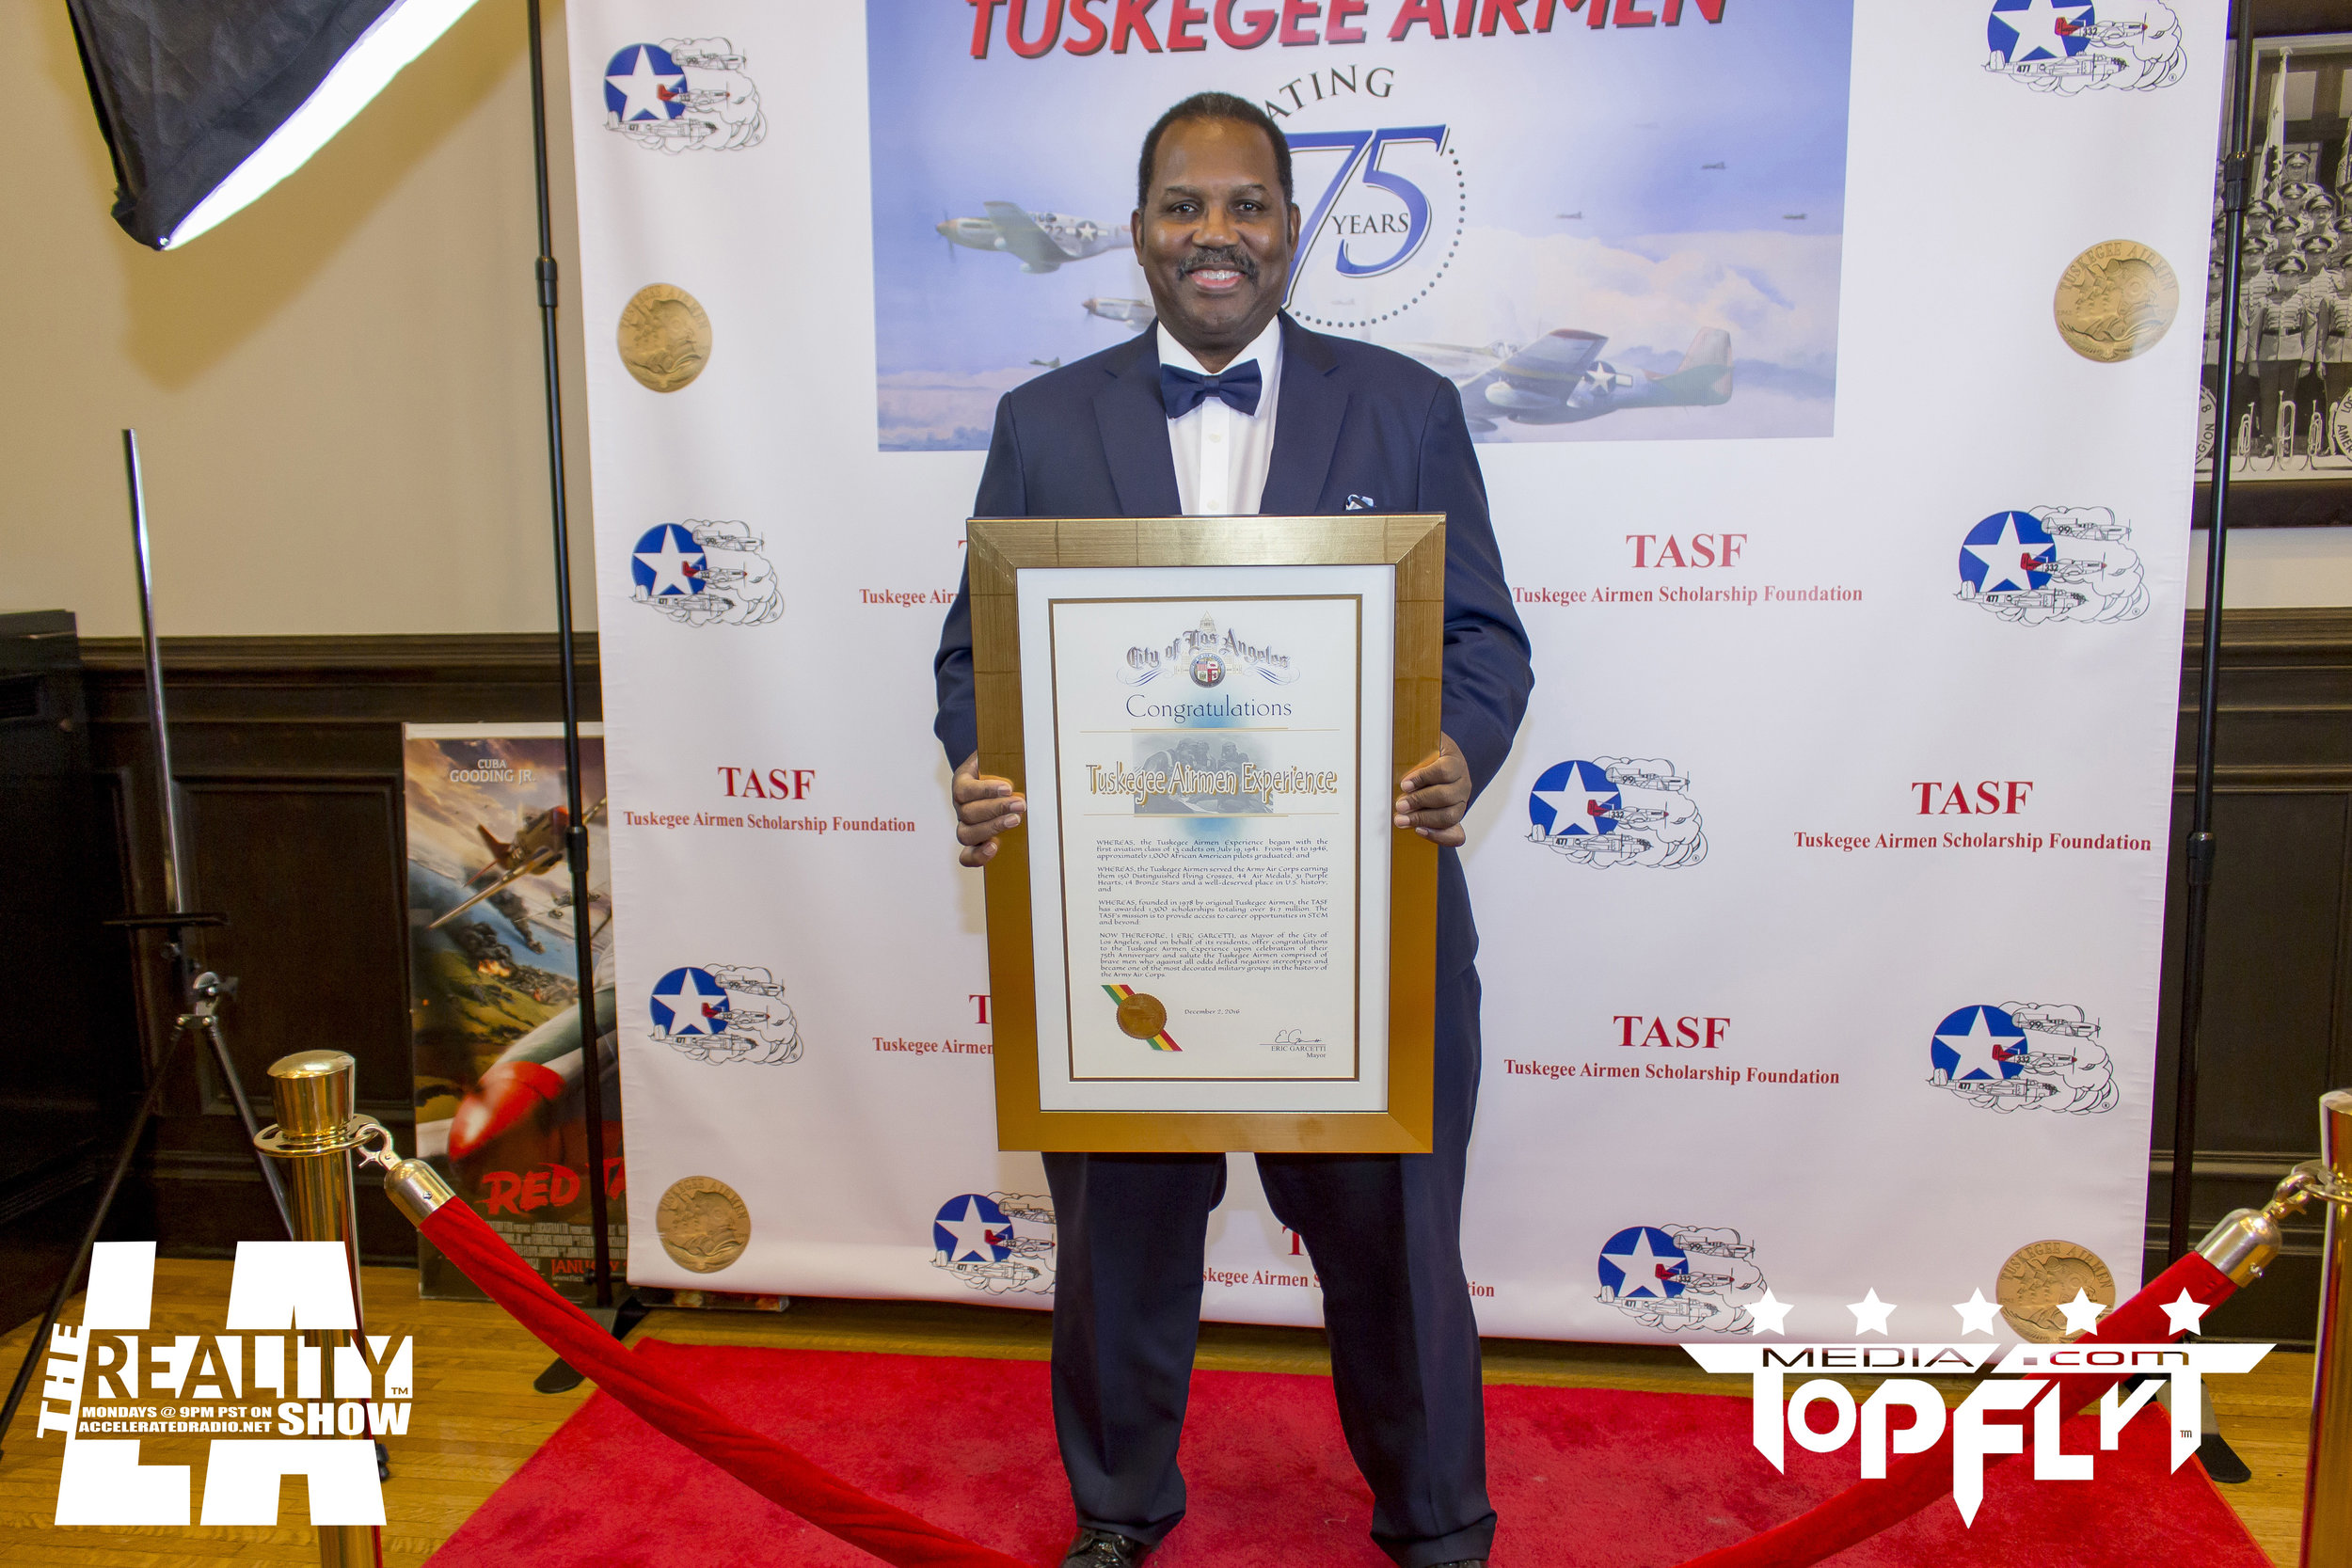 The Reality Show LA - Tuskegee Airmen 75th Anniversary VIP Reception_111.jpg